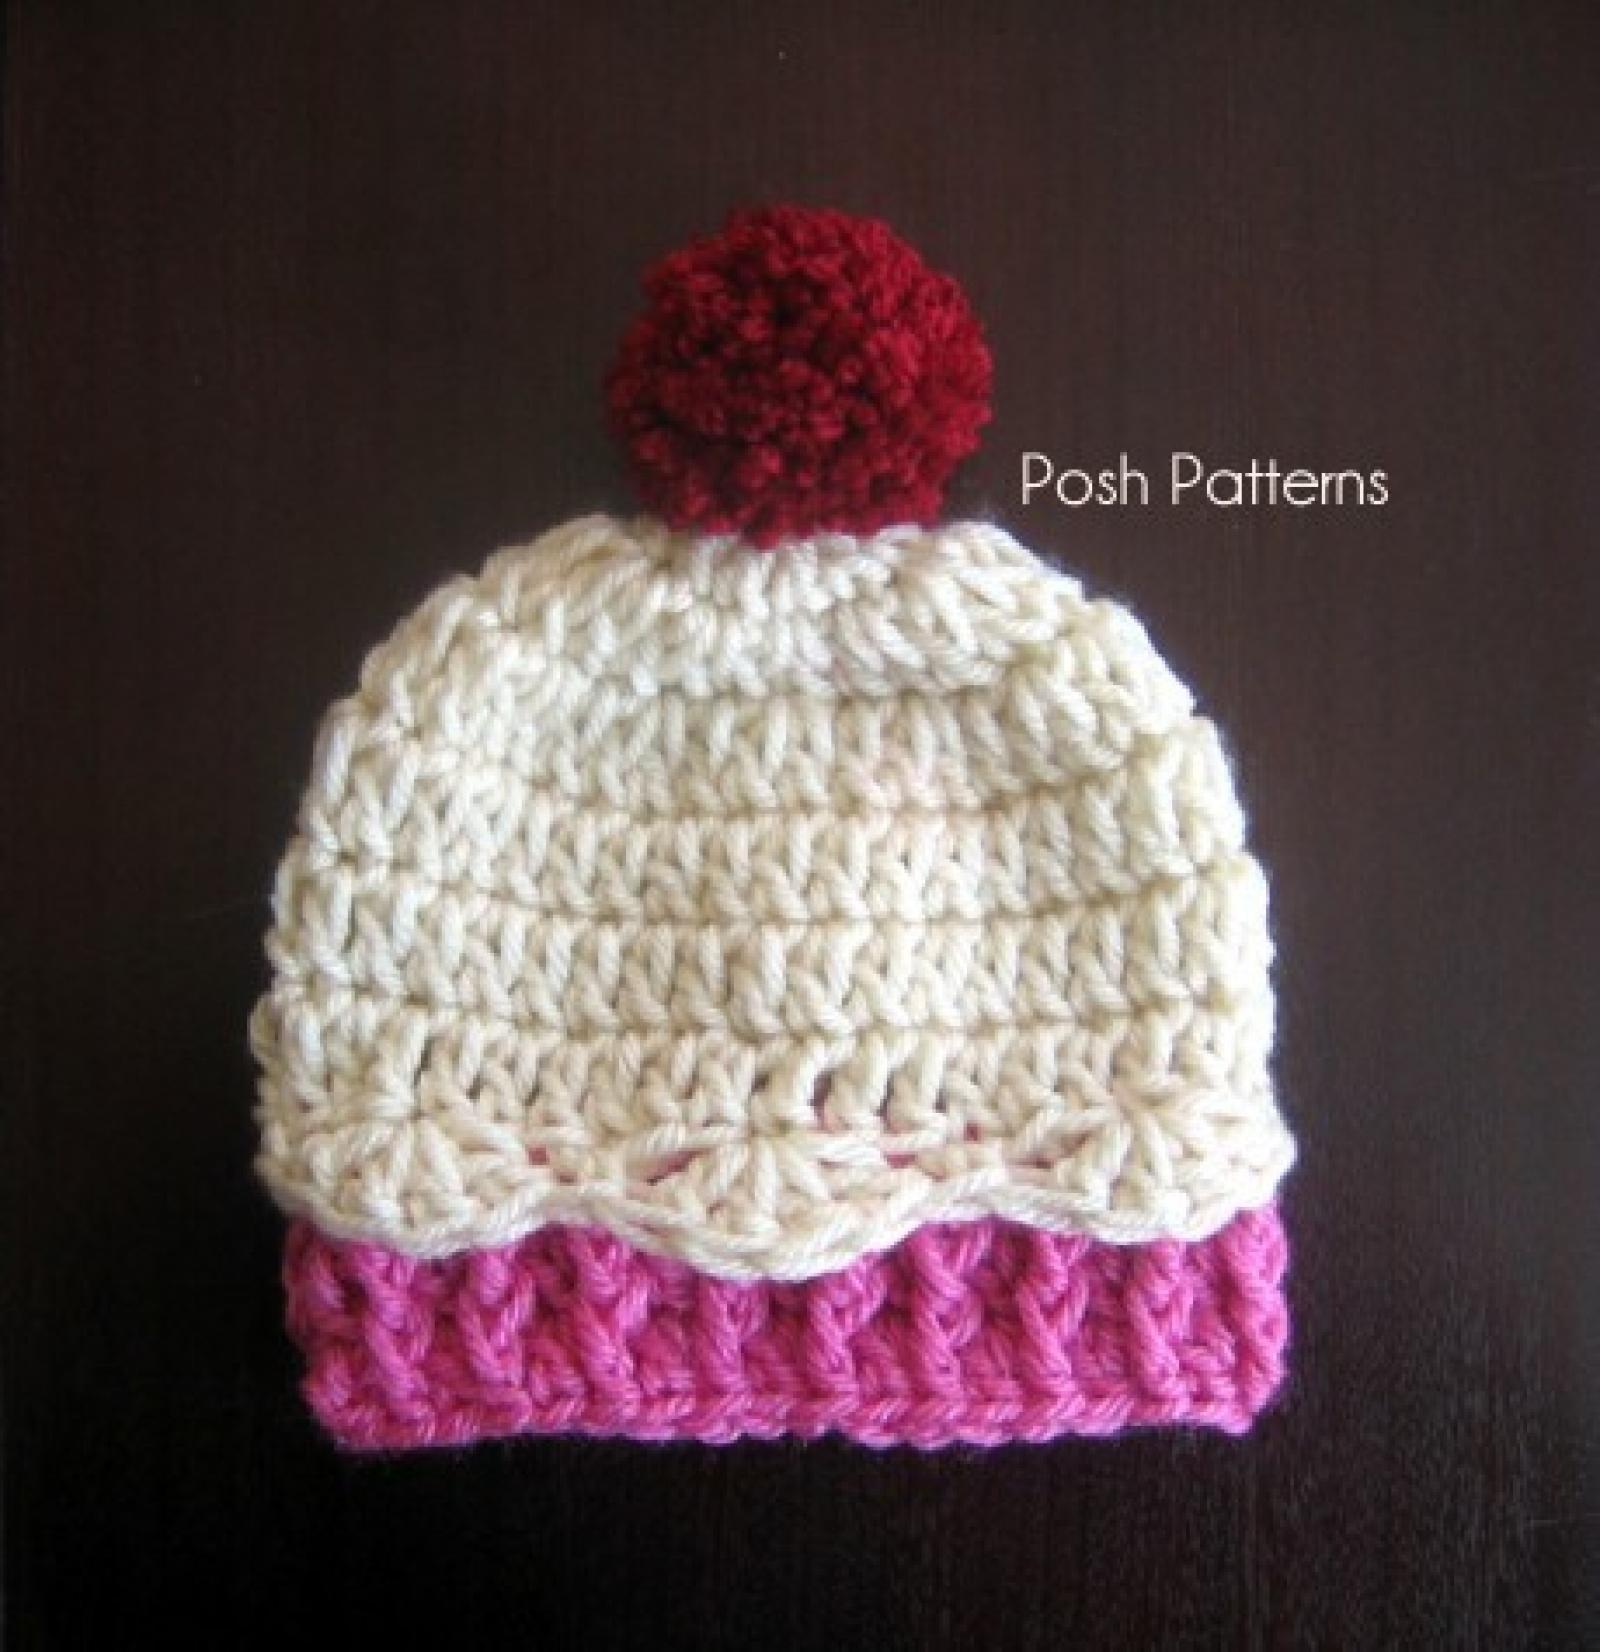 Crochet cupcake hat pattern newborn to 12 months sizes crochet cupcake hat pattern 3 sizes bankloansurffo Images